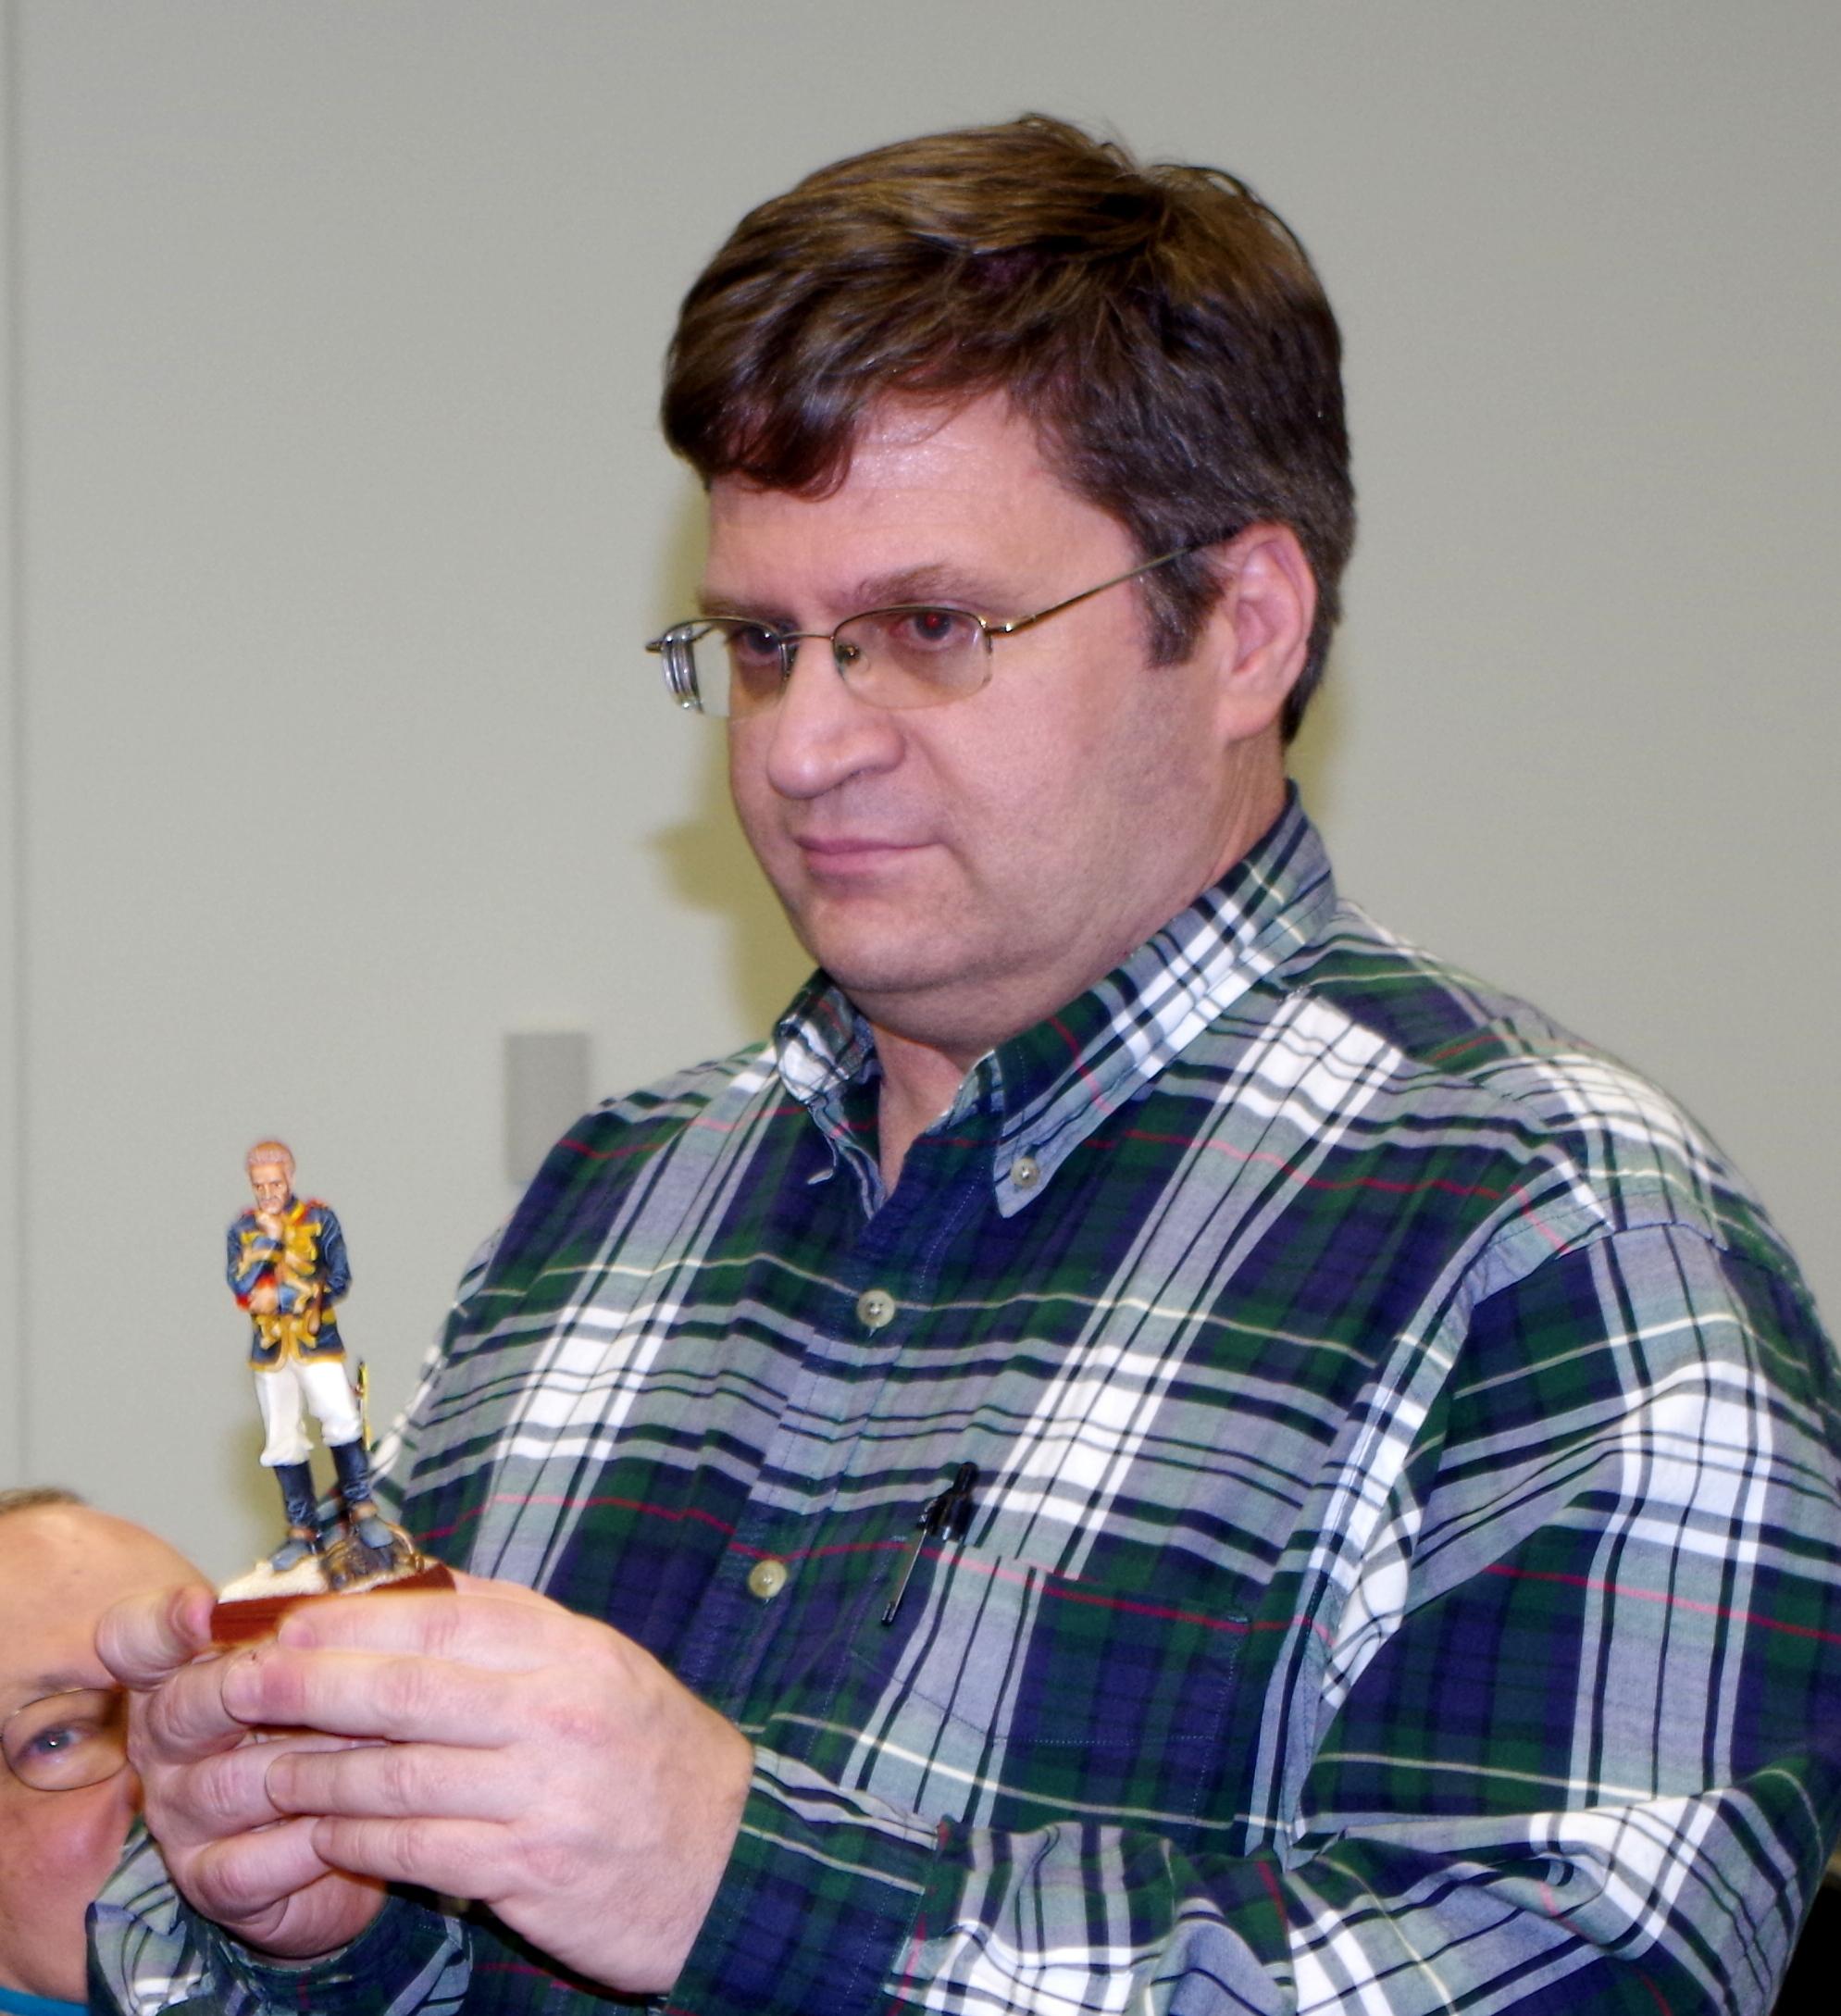 Pat Vess, current show chairman  (John VanDerMeulen, co-chair, 2013-14)